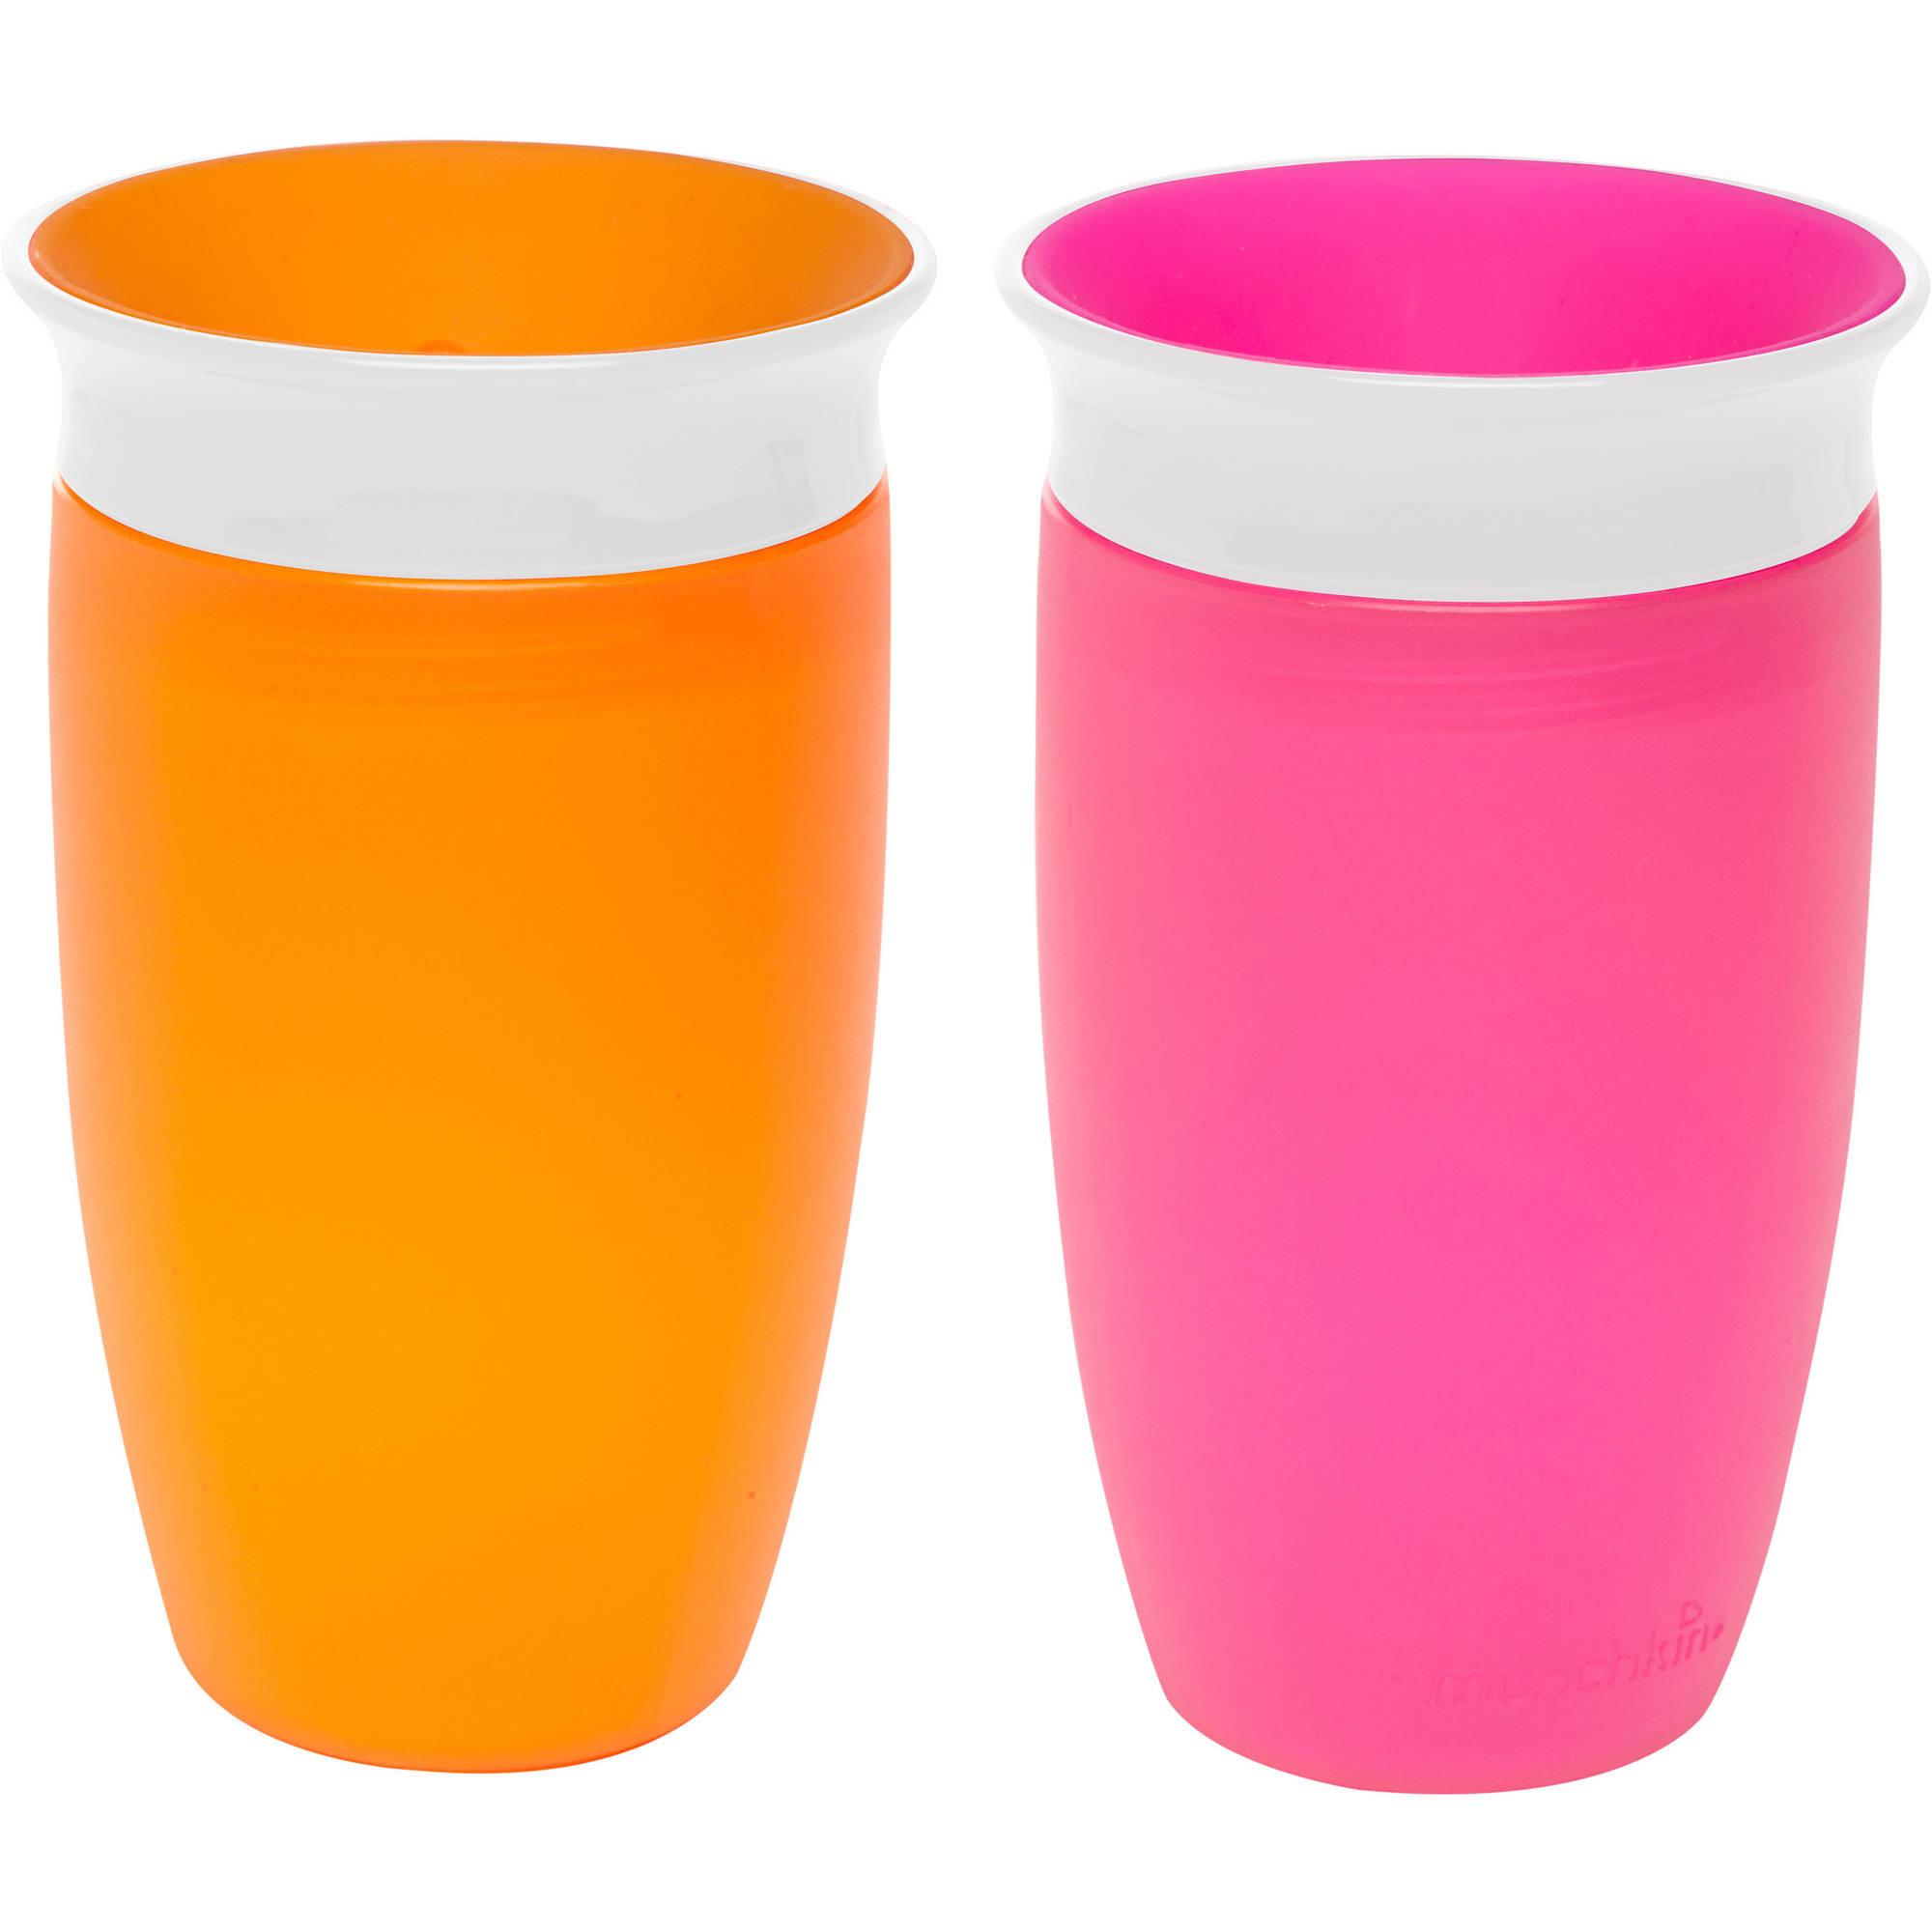 Munchkin Miracle 360 10oz Sippy Cup, BPA-Free, 2-Pack, Pink/Orange